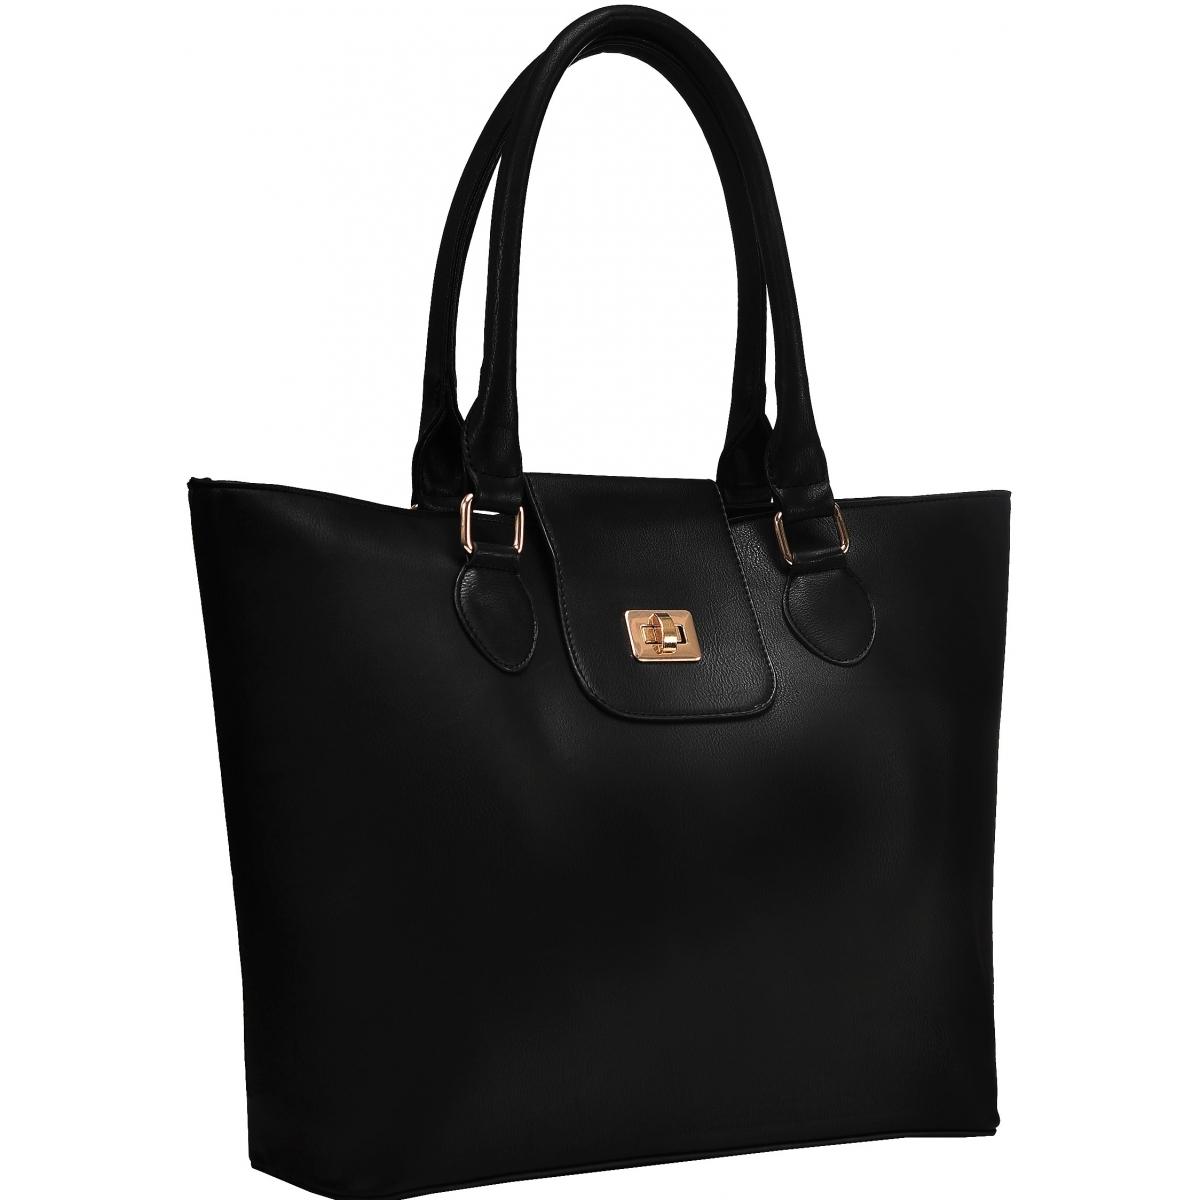 sac main shopping krlot taille l fkg0300 couleur. Black Bedroom Furniture Sets. Home Design Ideas